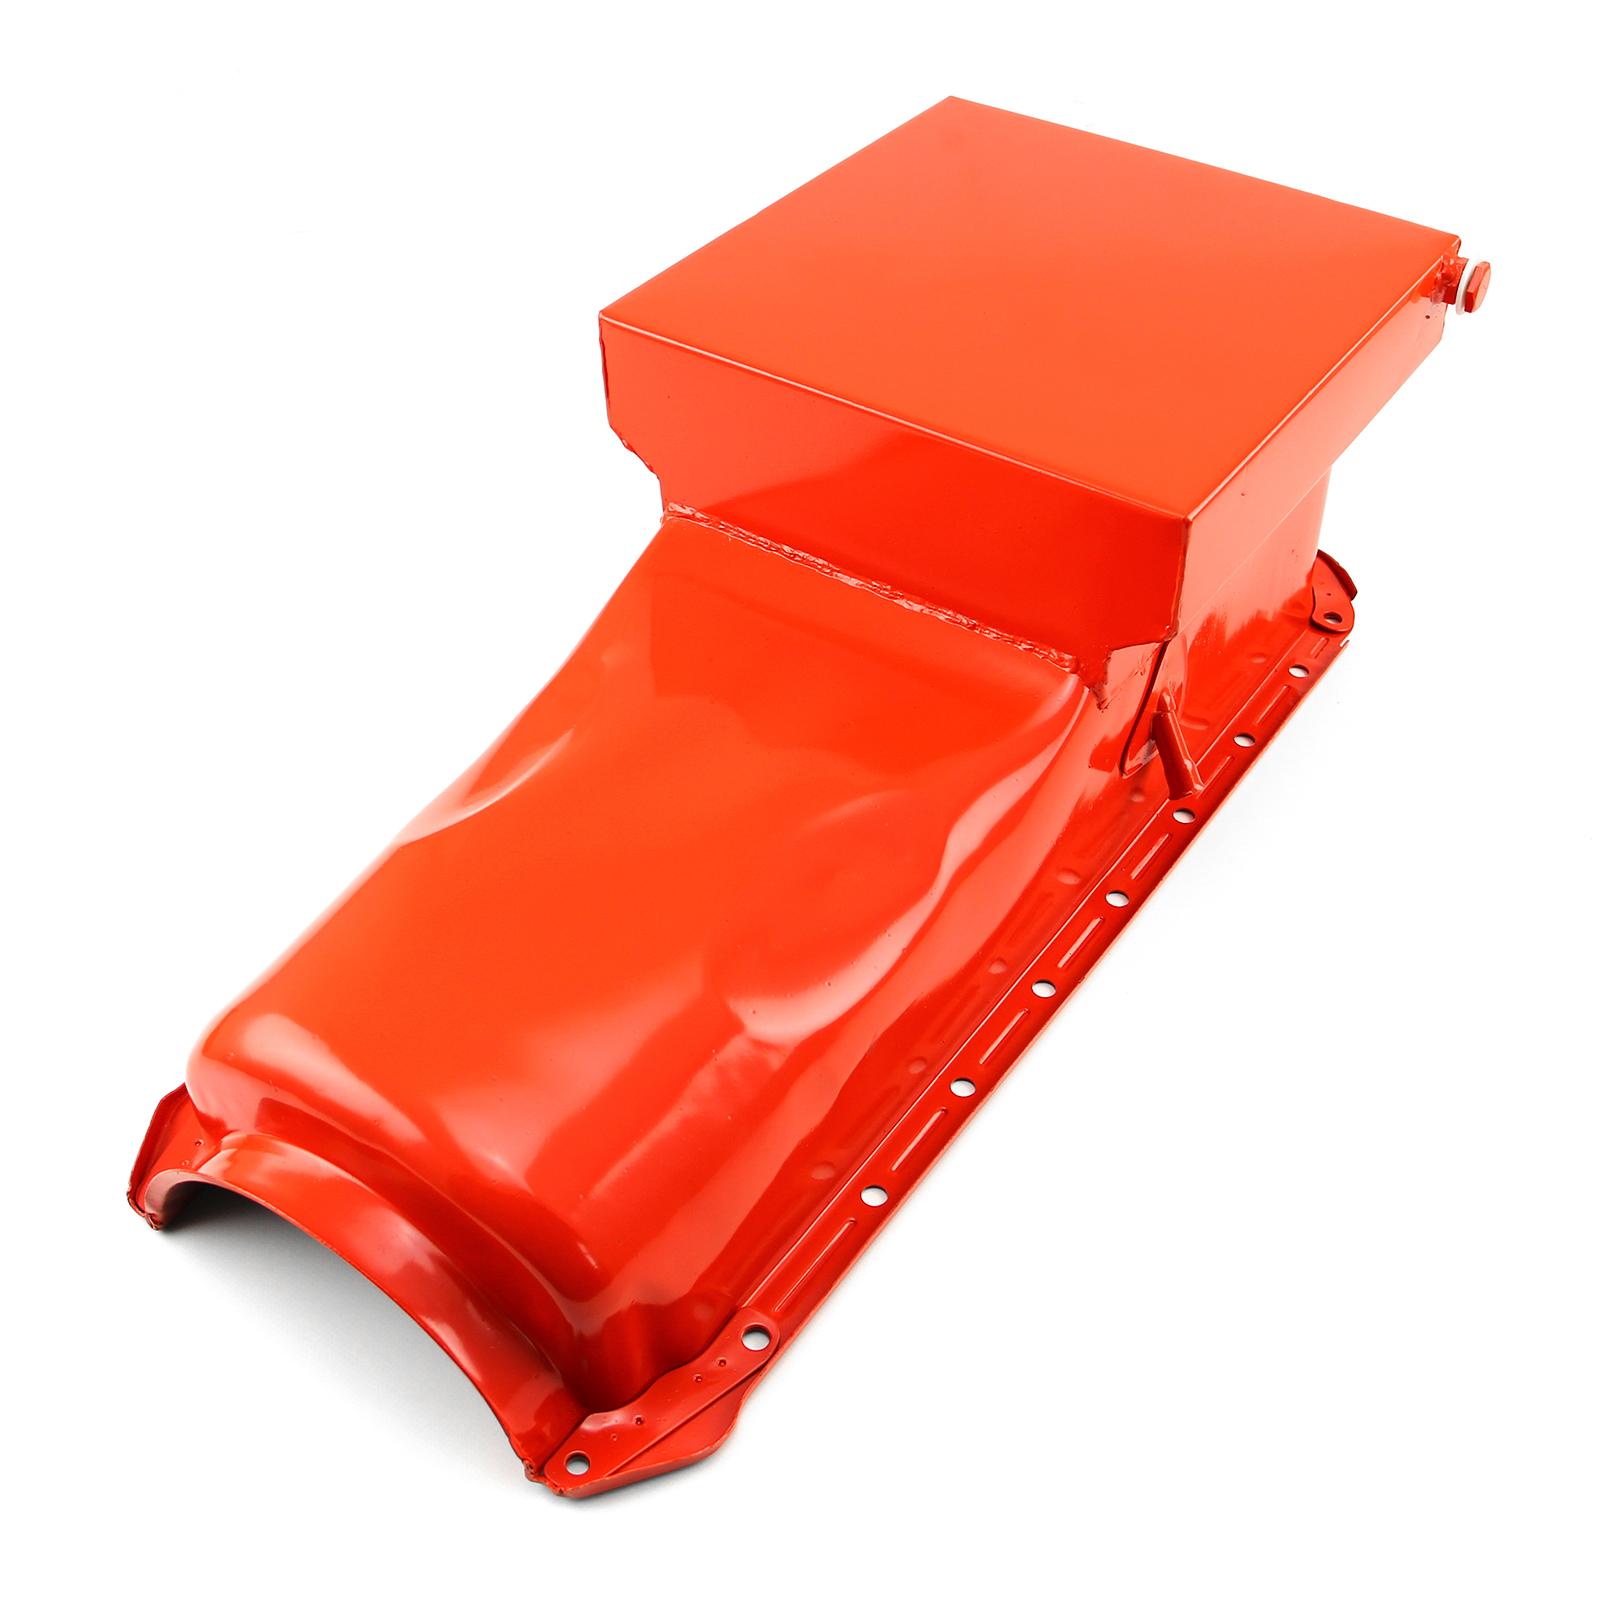 Chevy BBC 454 Gen 4 6Qt Drag Rear Sump 2Pc Rms Orange Oil Pan